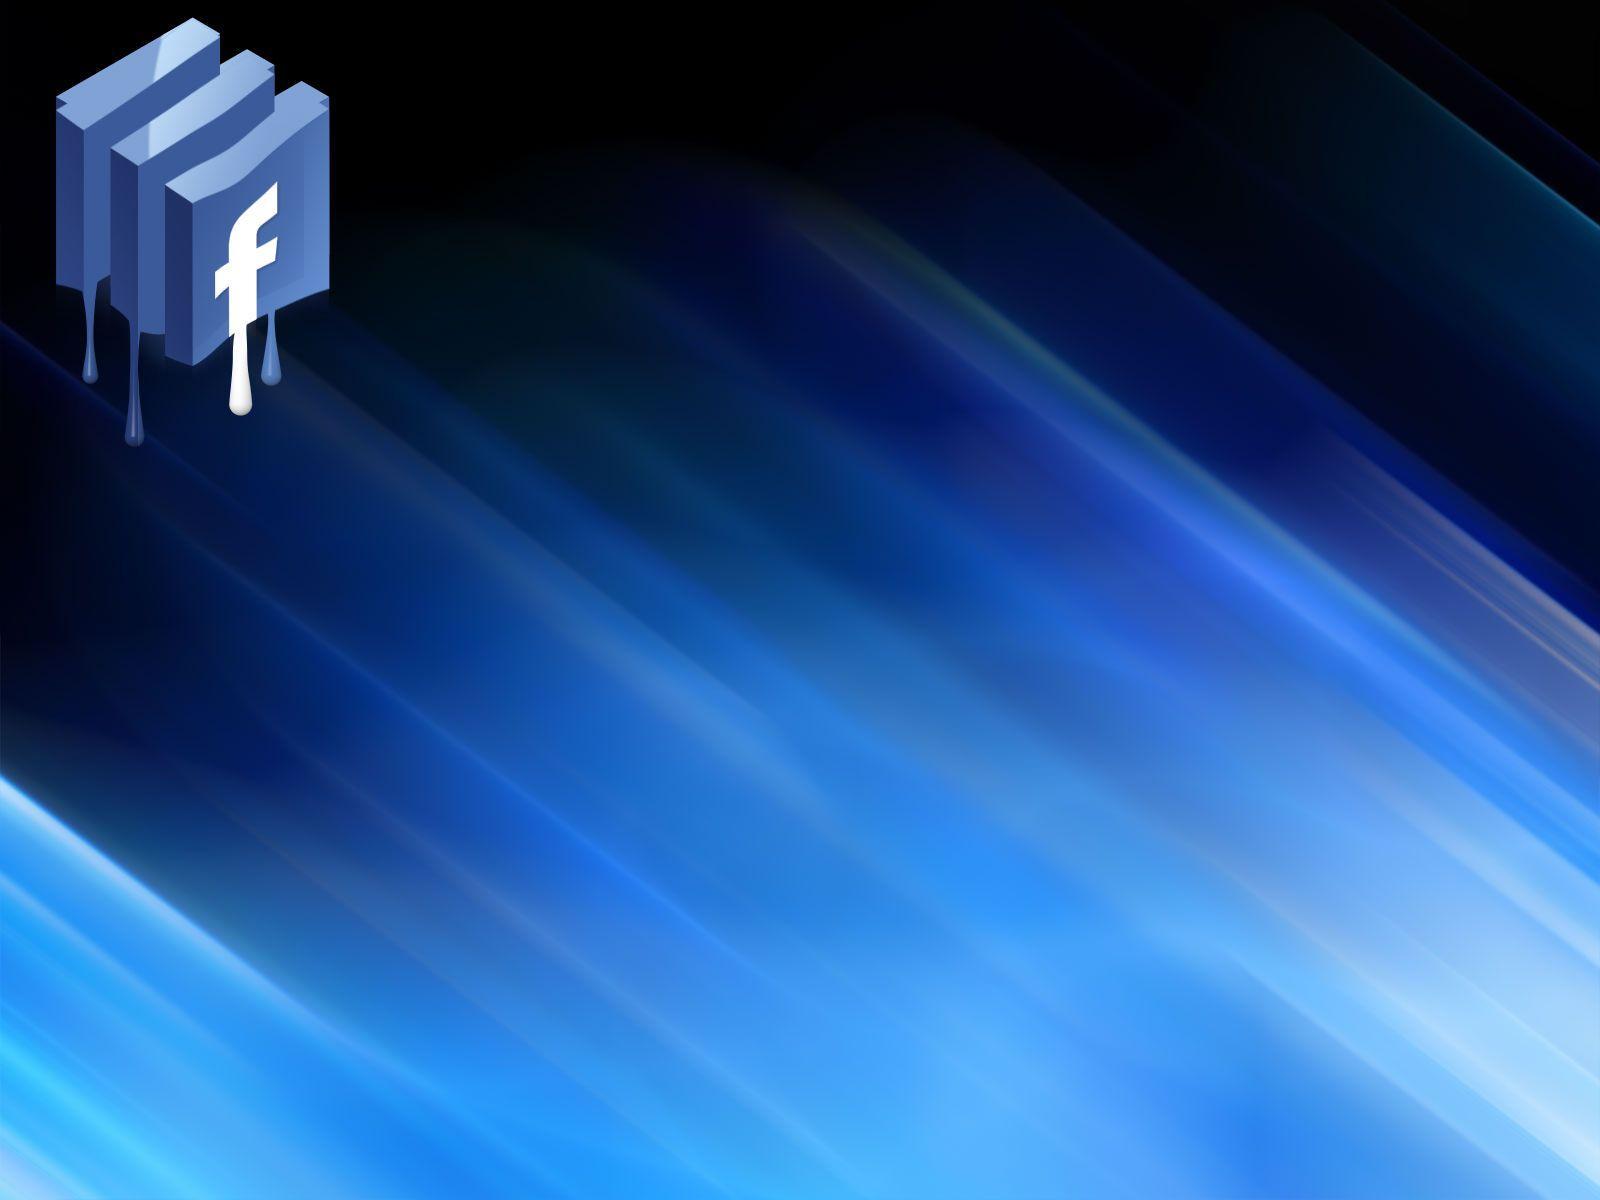 facebook logo wallpapers